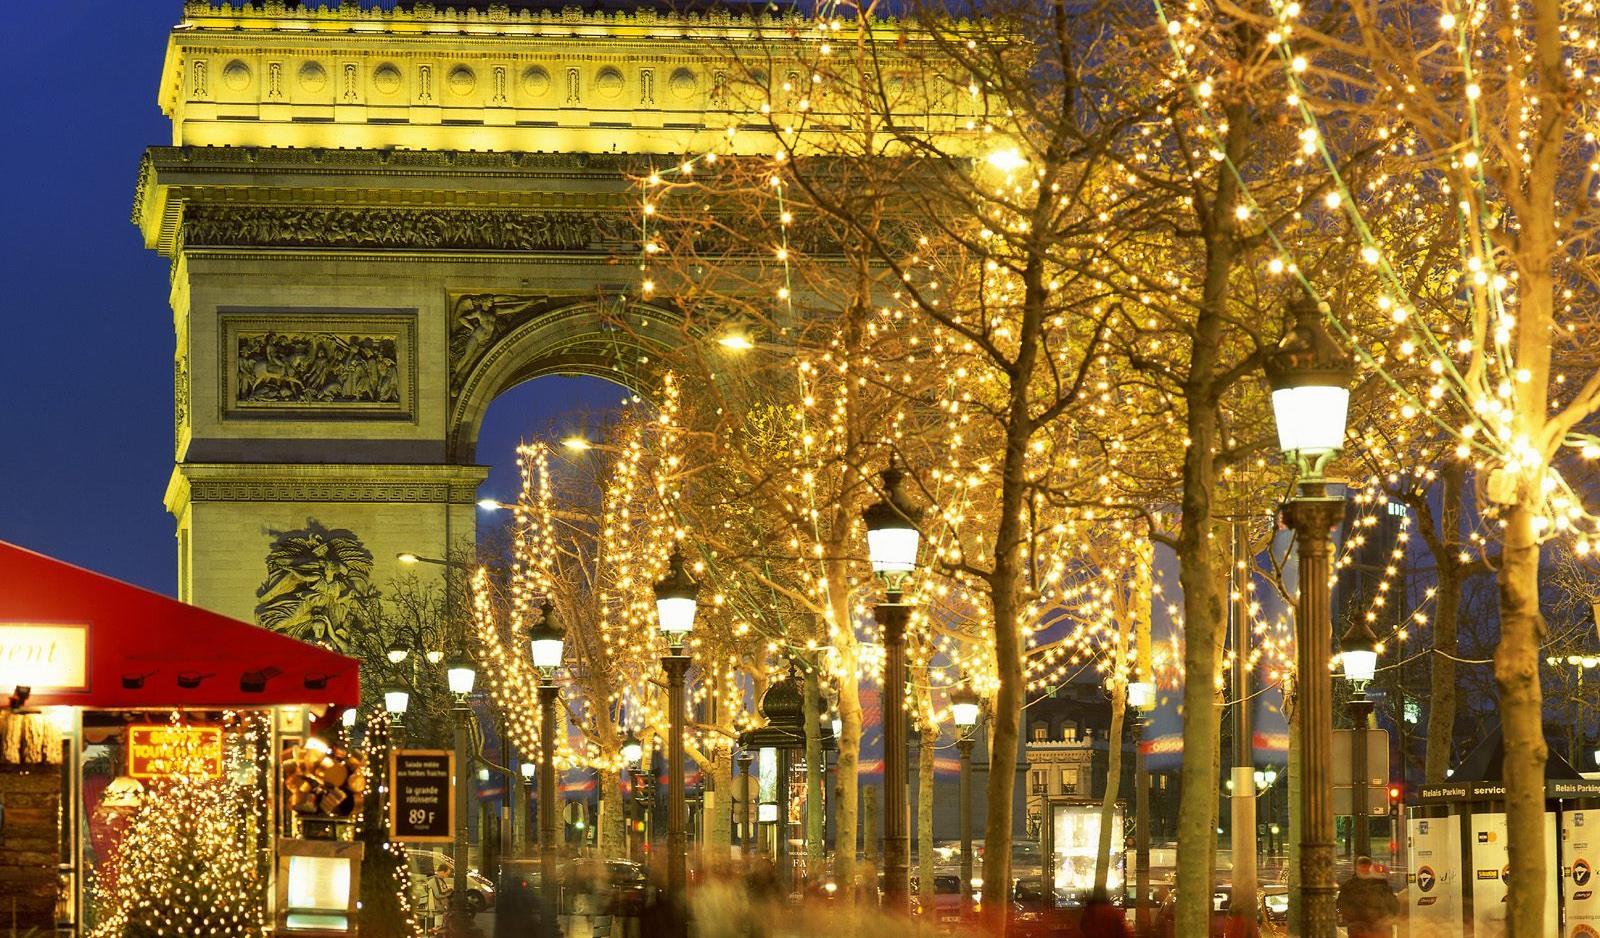 В Париж на встречу Новому году 2018!